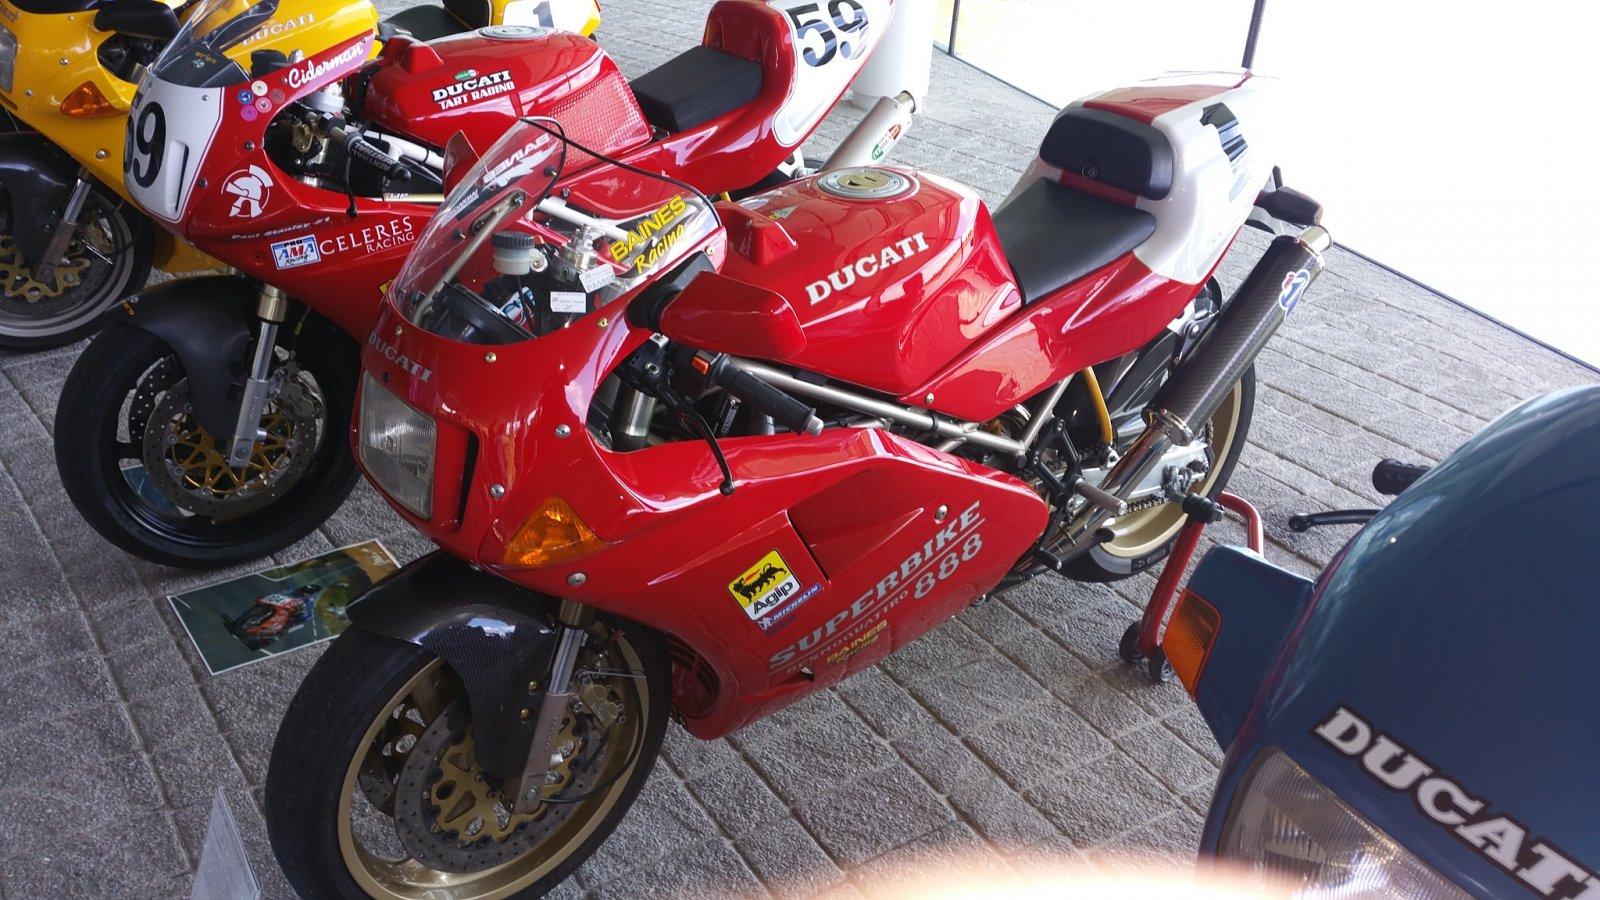 Ducati Dealer South London